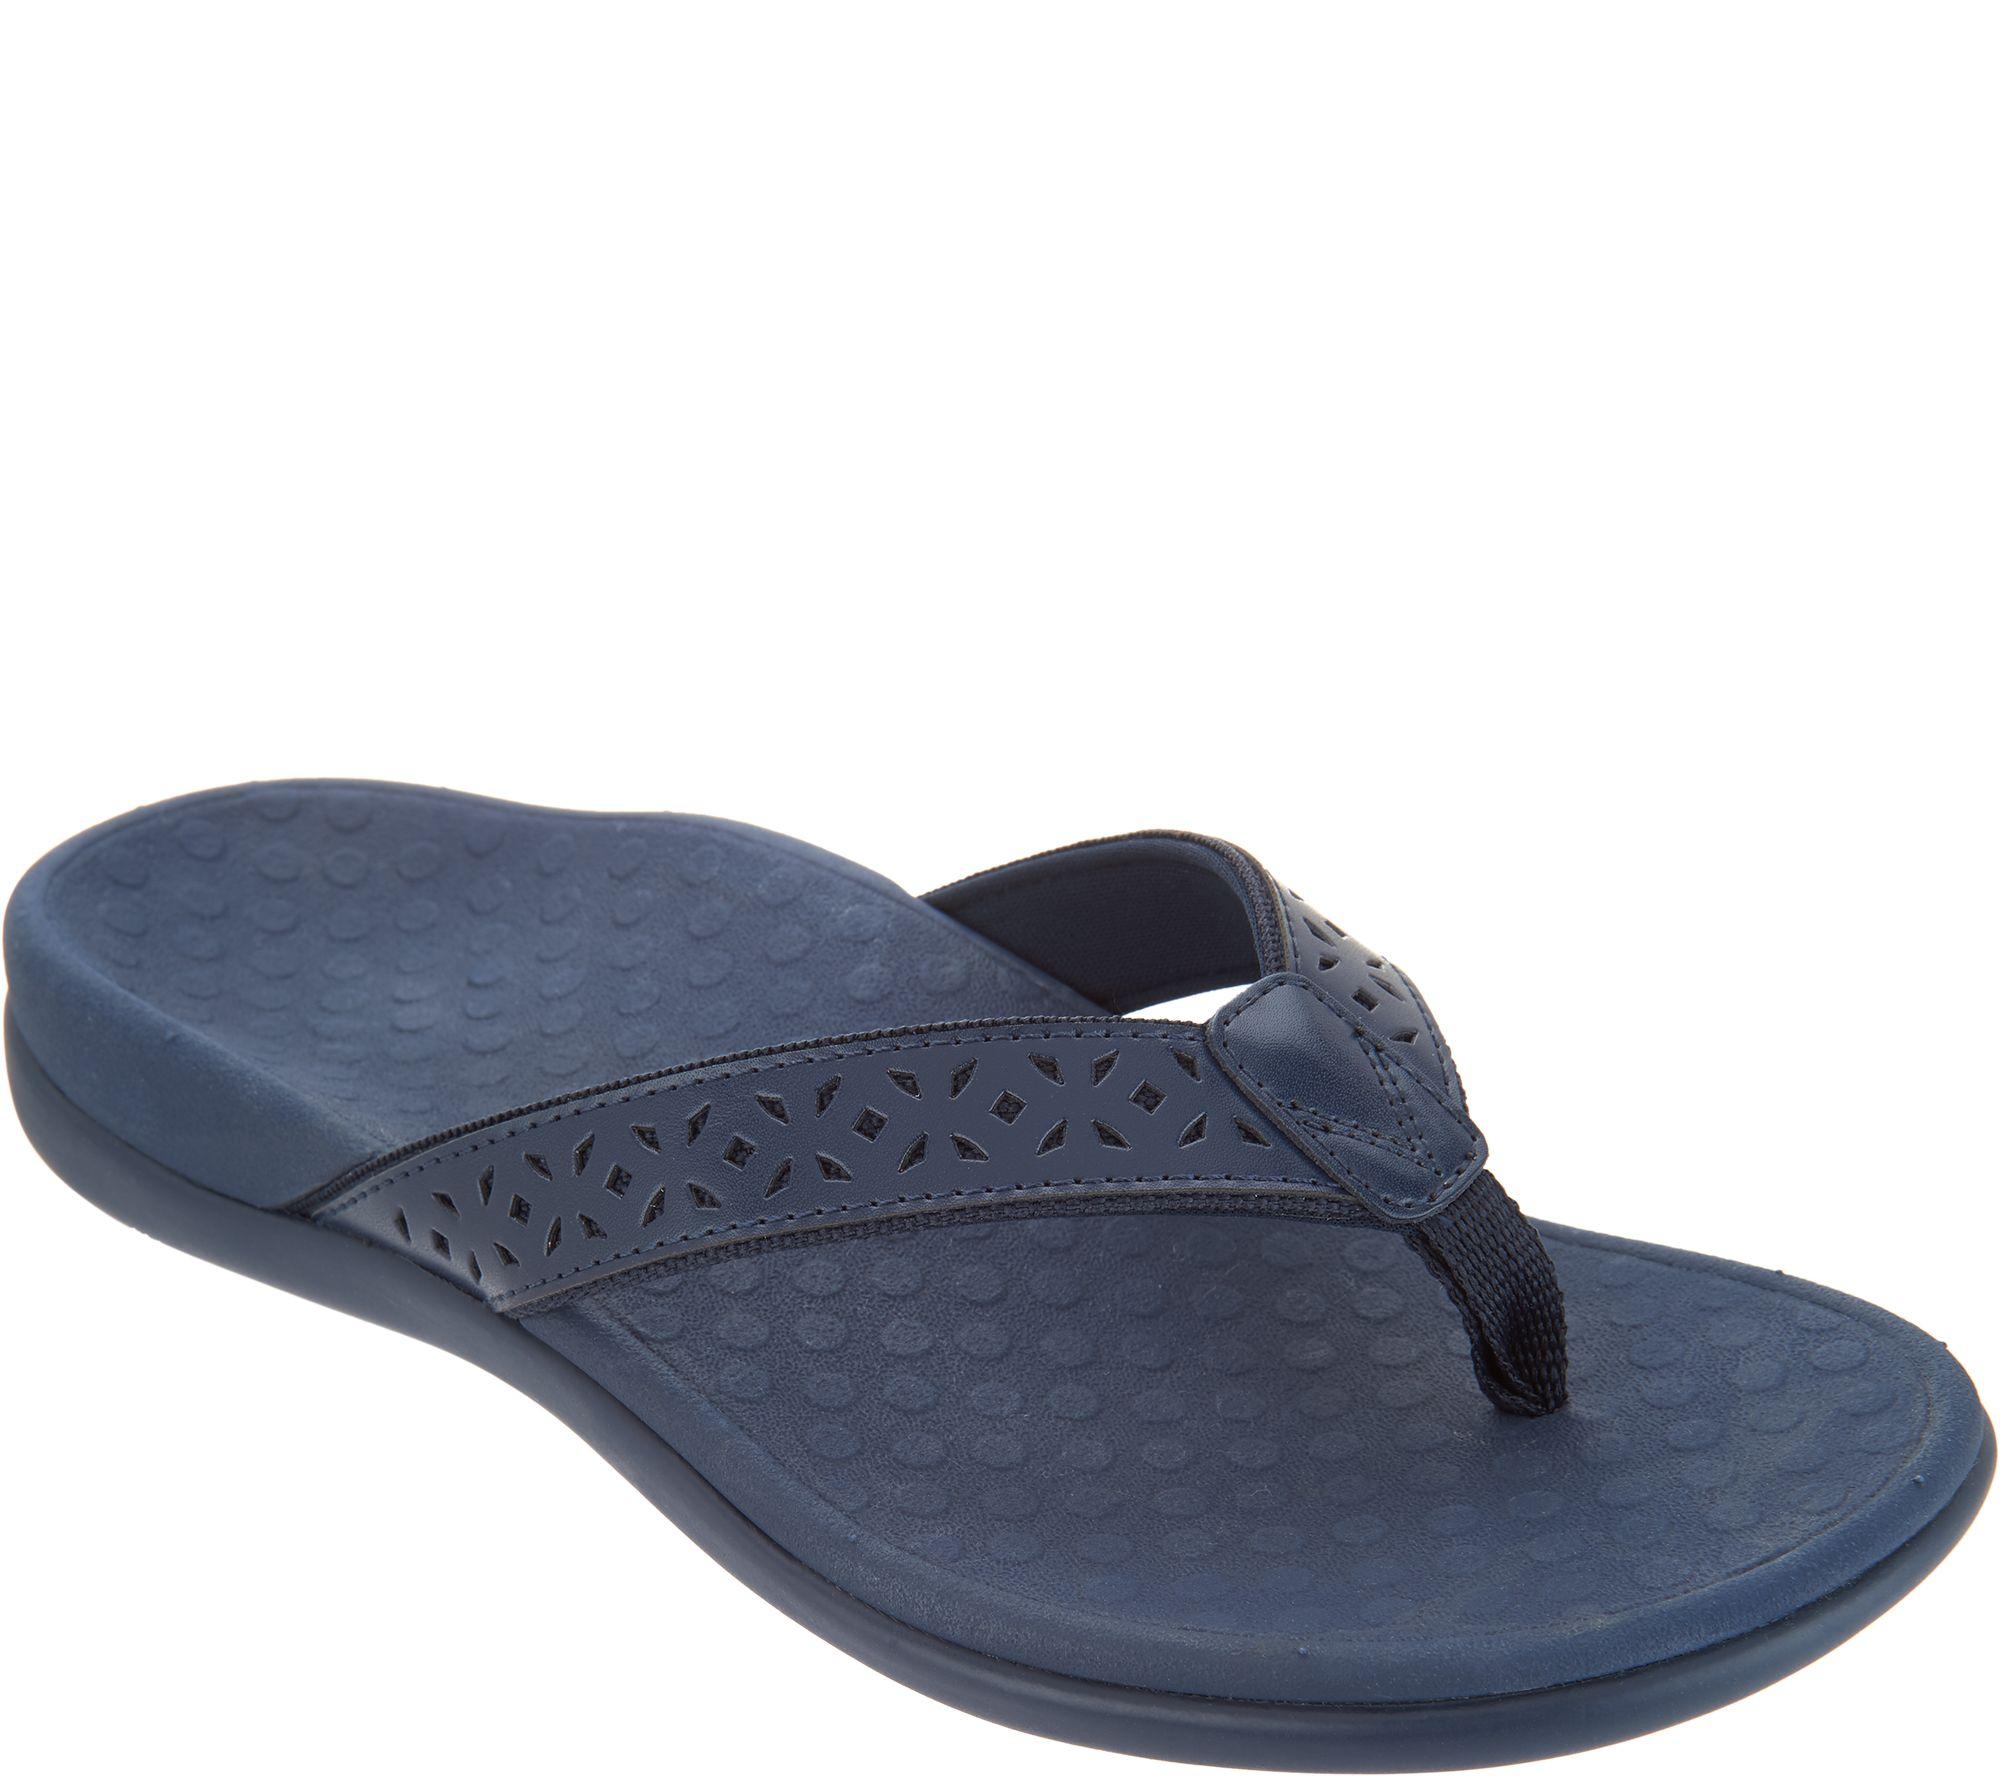 fdad5b2e4d42 Vionic Leather Thong Sandals - Tide Anniversary - Page 1 — QVC.com